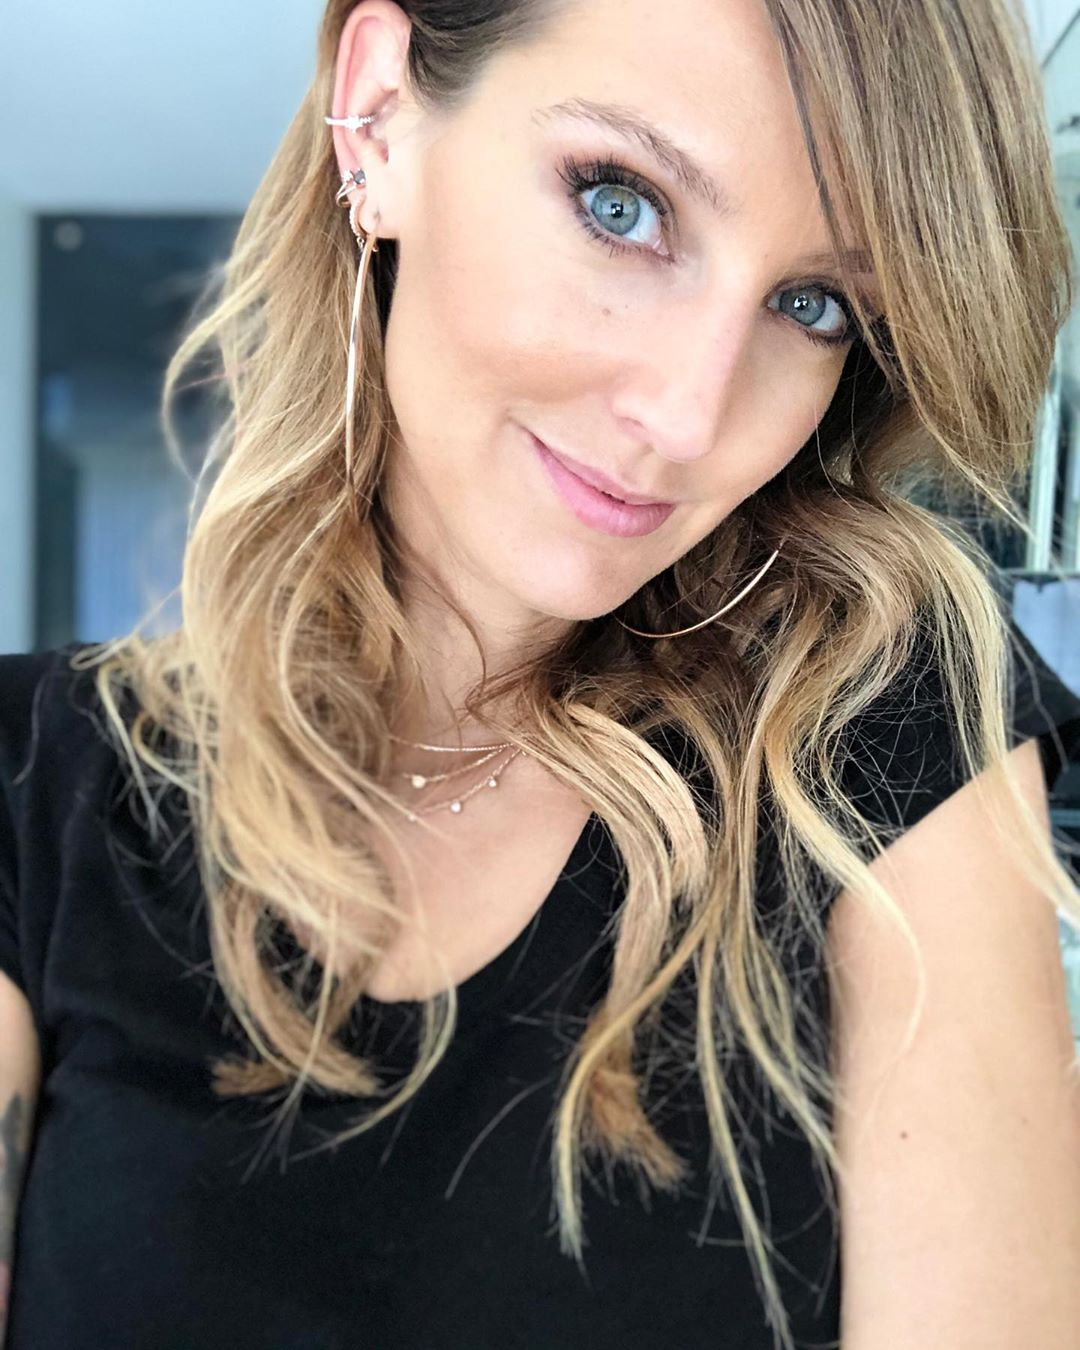 Diana Pereira